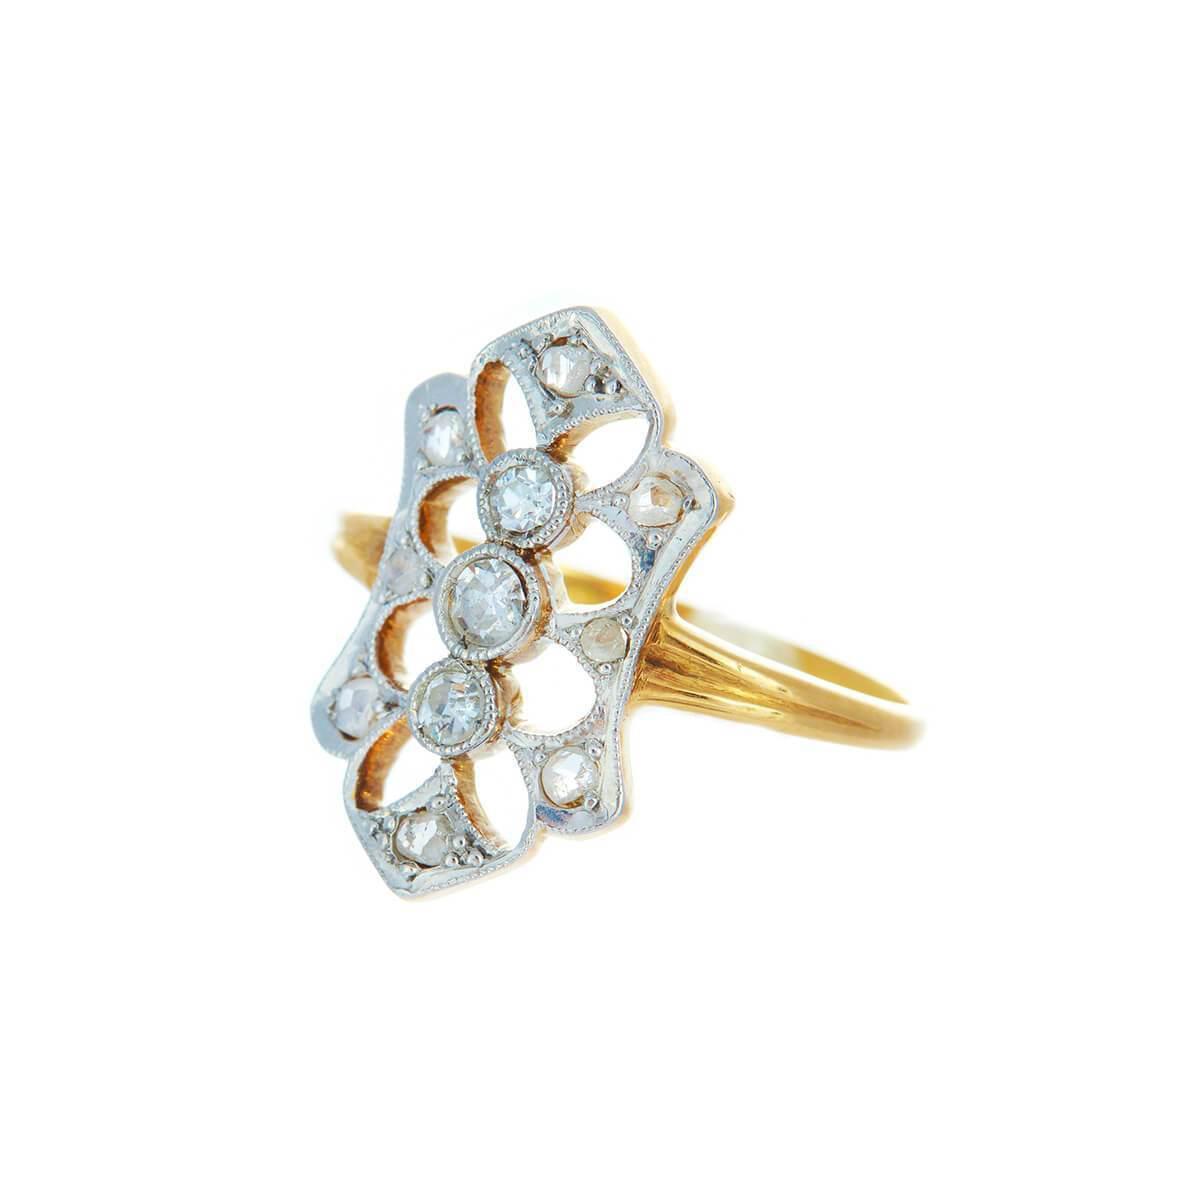 Alexis Danielle Jewelry Antique Art Deco Diamond And Platinum 18kt Yellow Gold Ring in Metallic